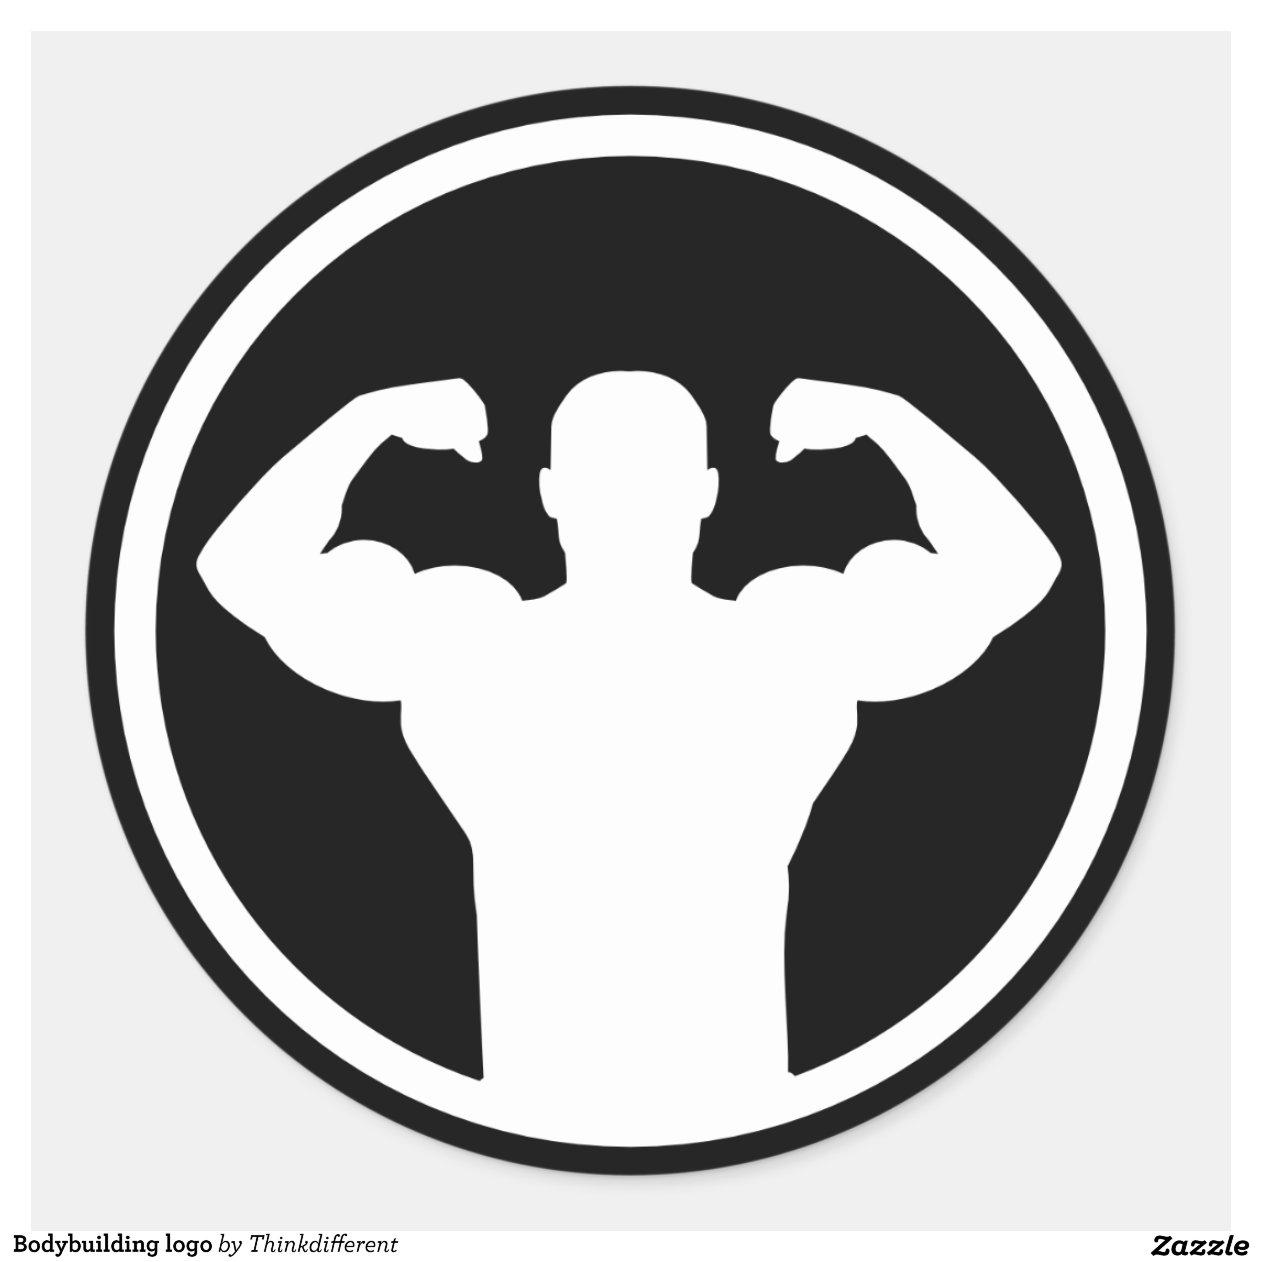 R Symbol Logo Bodybuilding logo classic